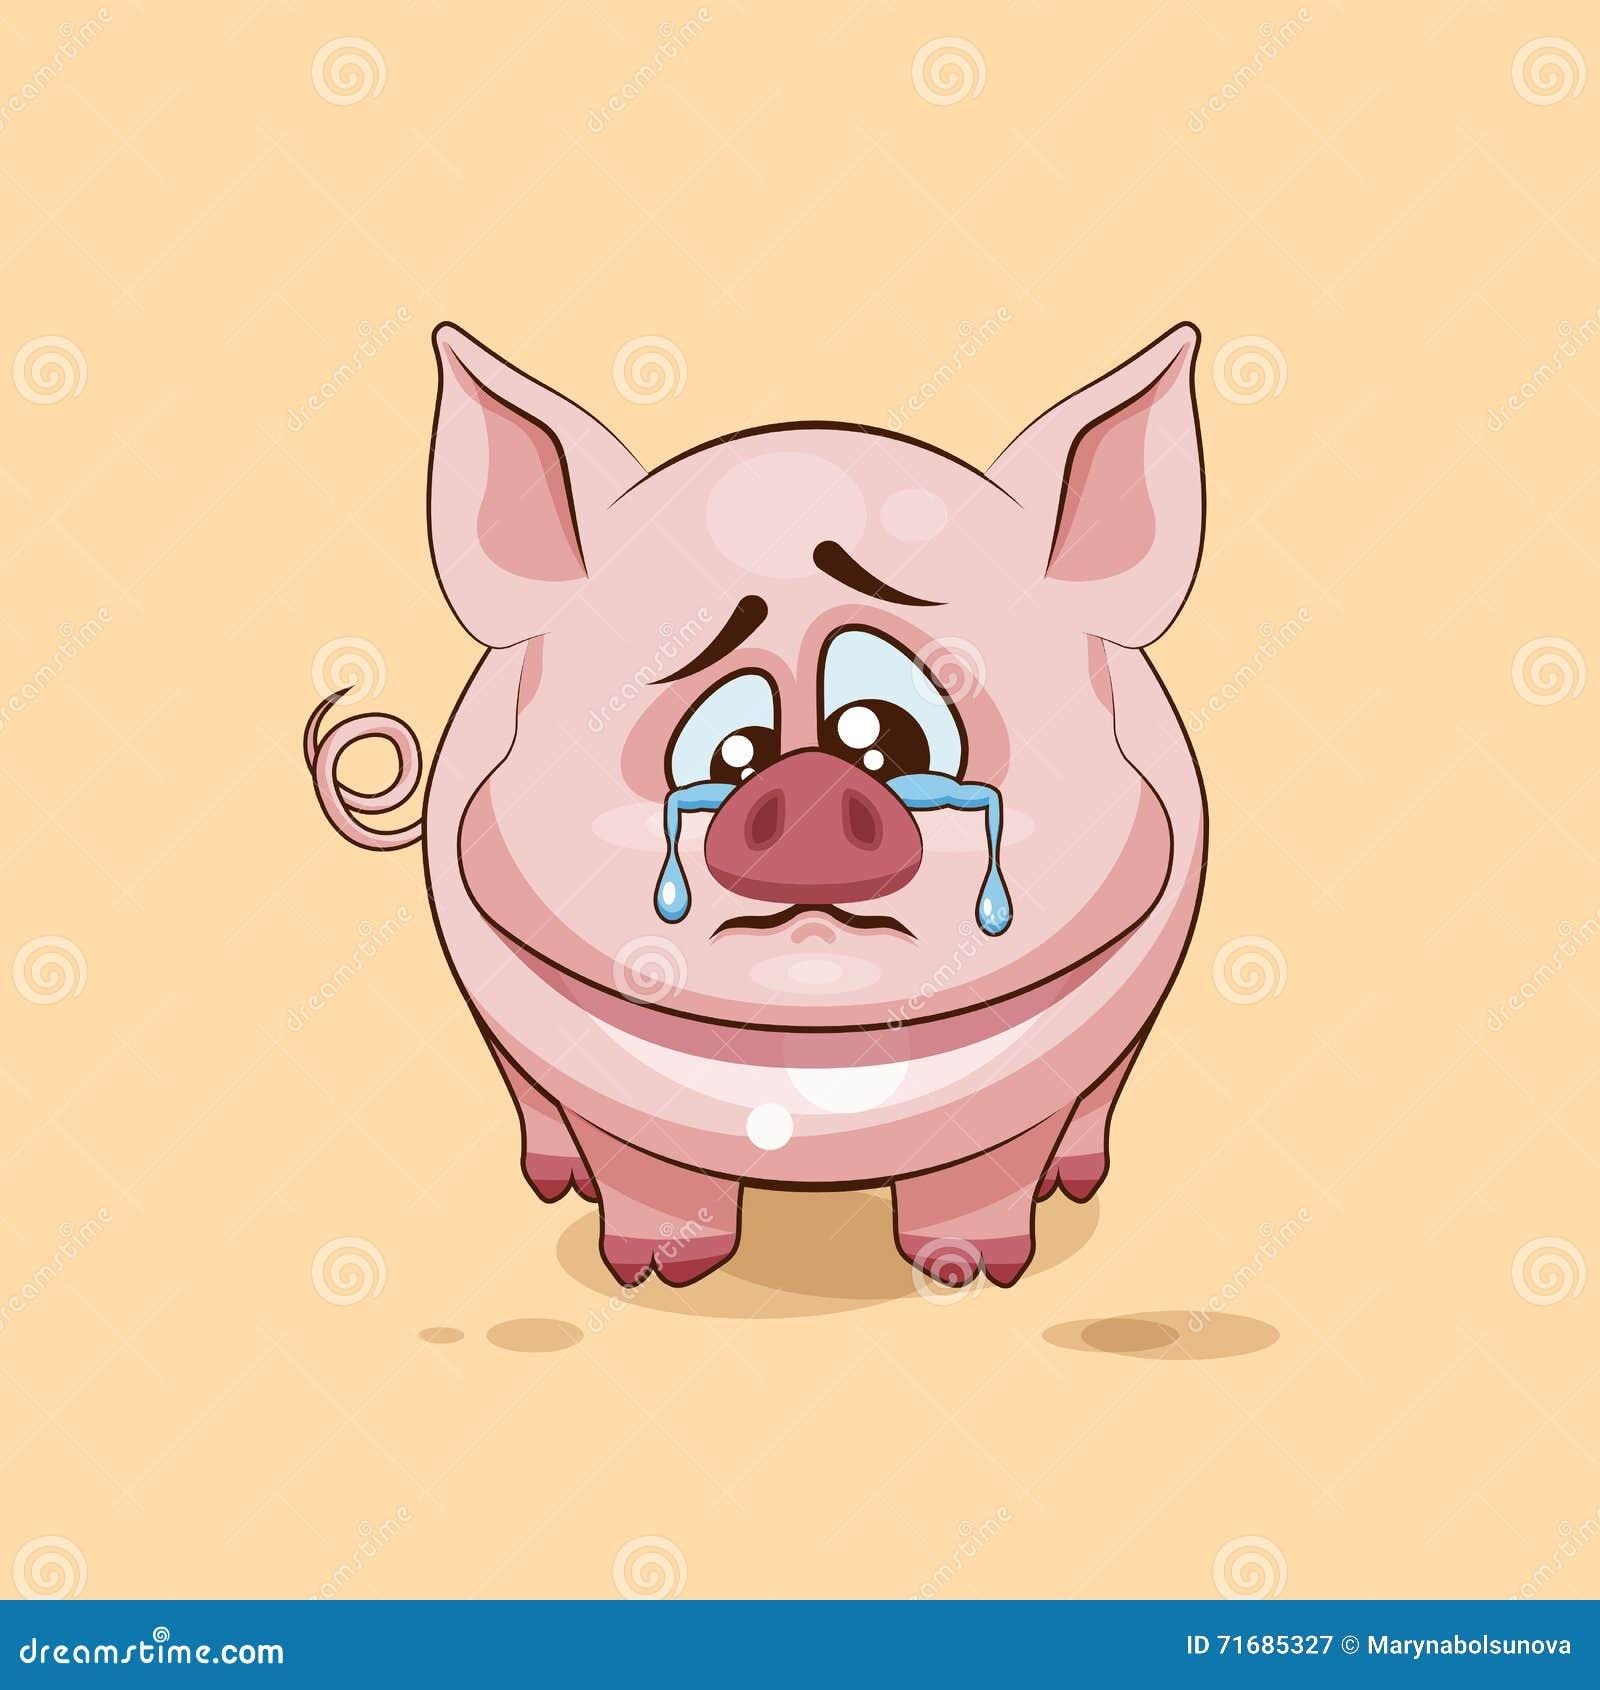 Cartoon Pig Crying - Bing images